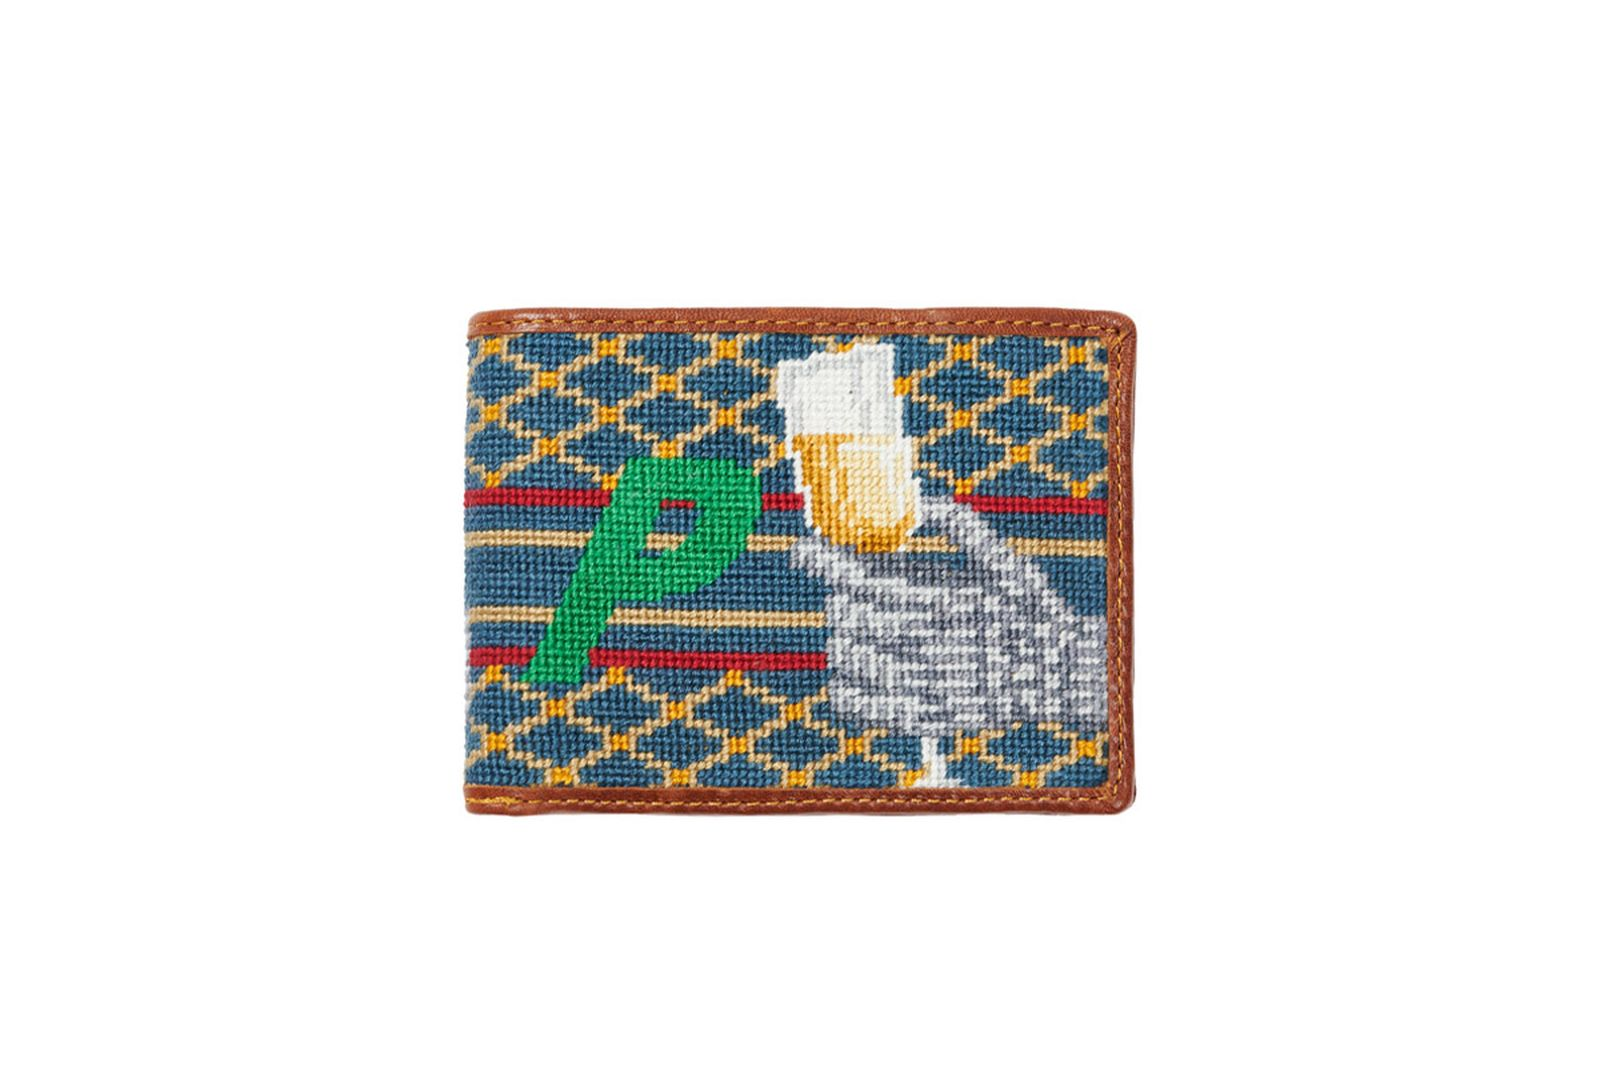 palace-crocs-classic-clog-release-date-price-07